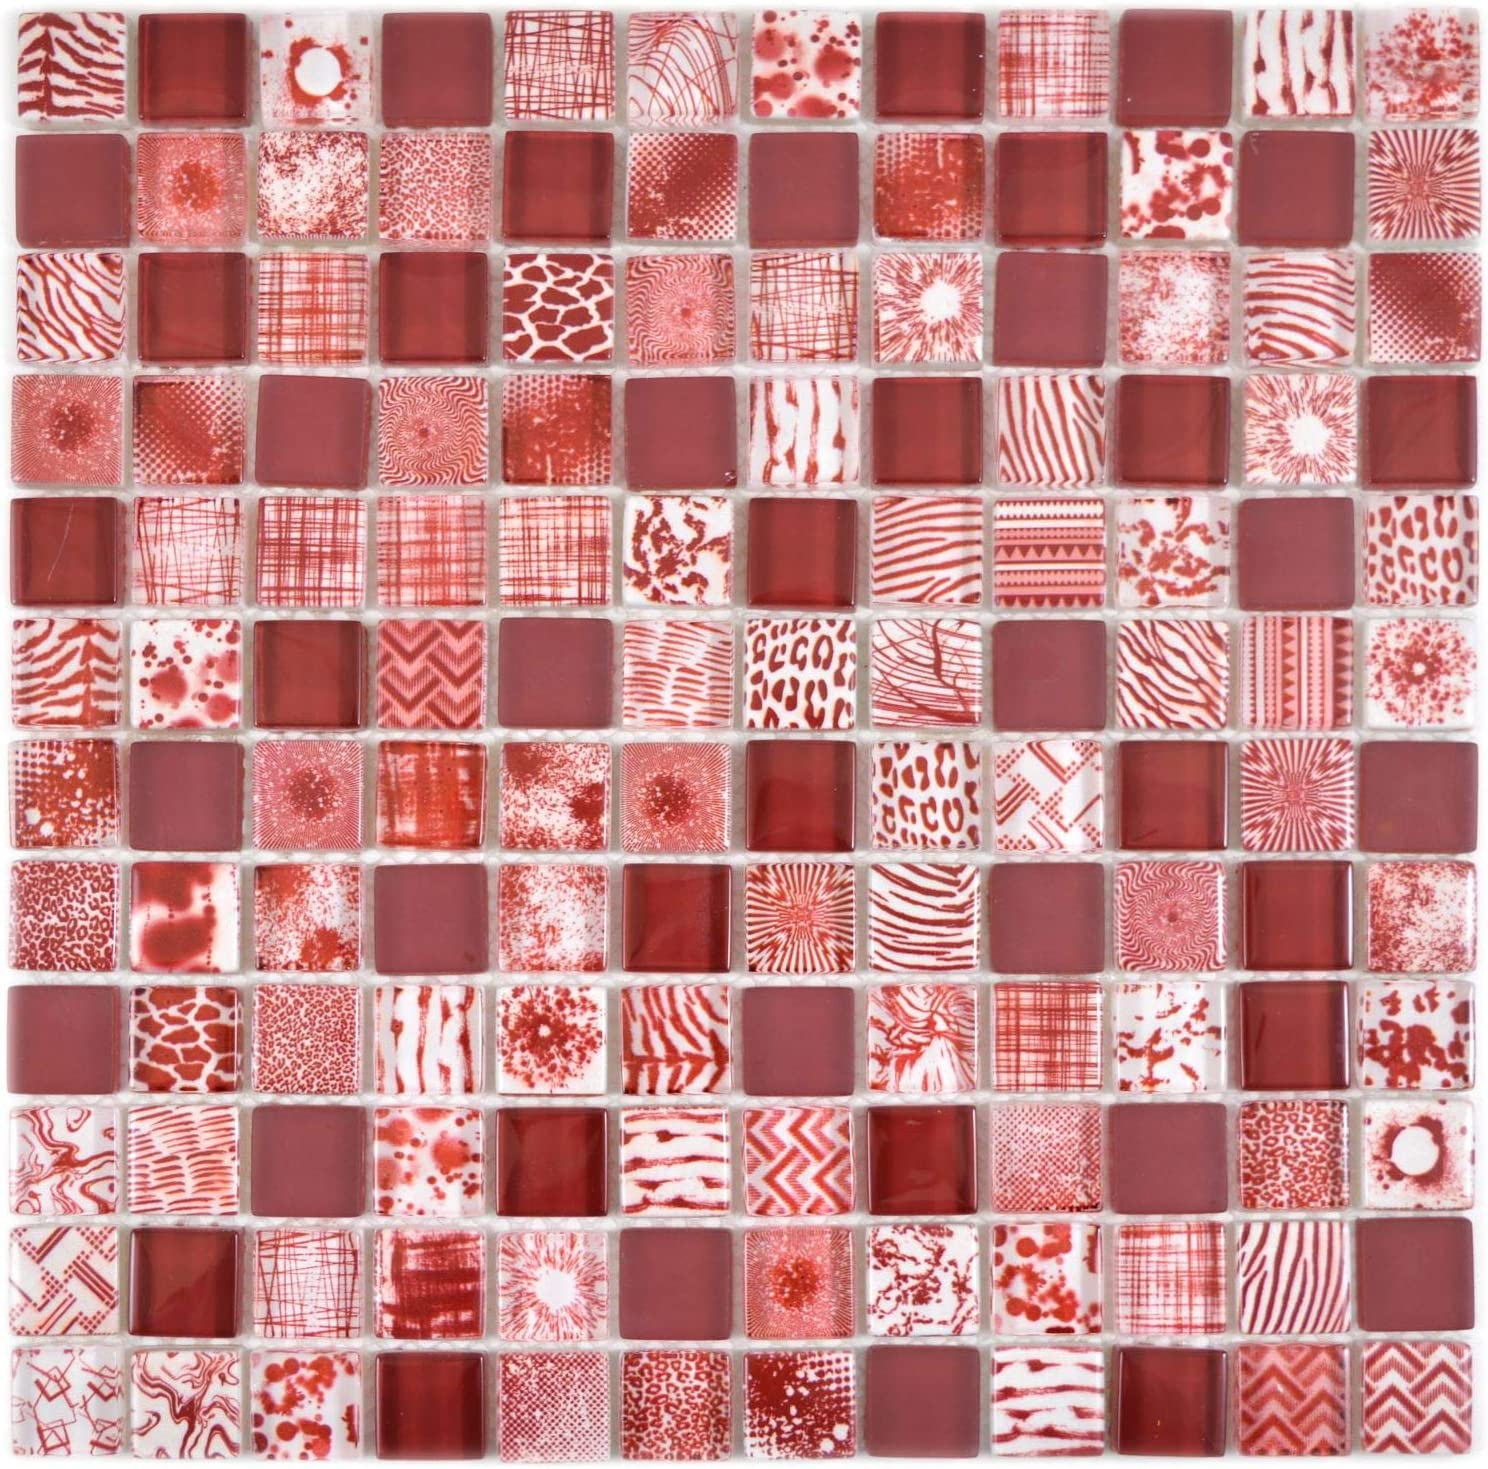 Mosaik Fliese Glasmosaik Quadrat Crystal mix rot f/ür WAND K/ÜCHE Fliesenspiegel Thekenverkleidung Wandverblender